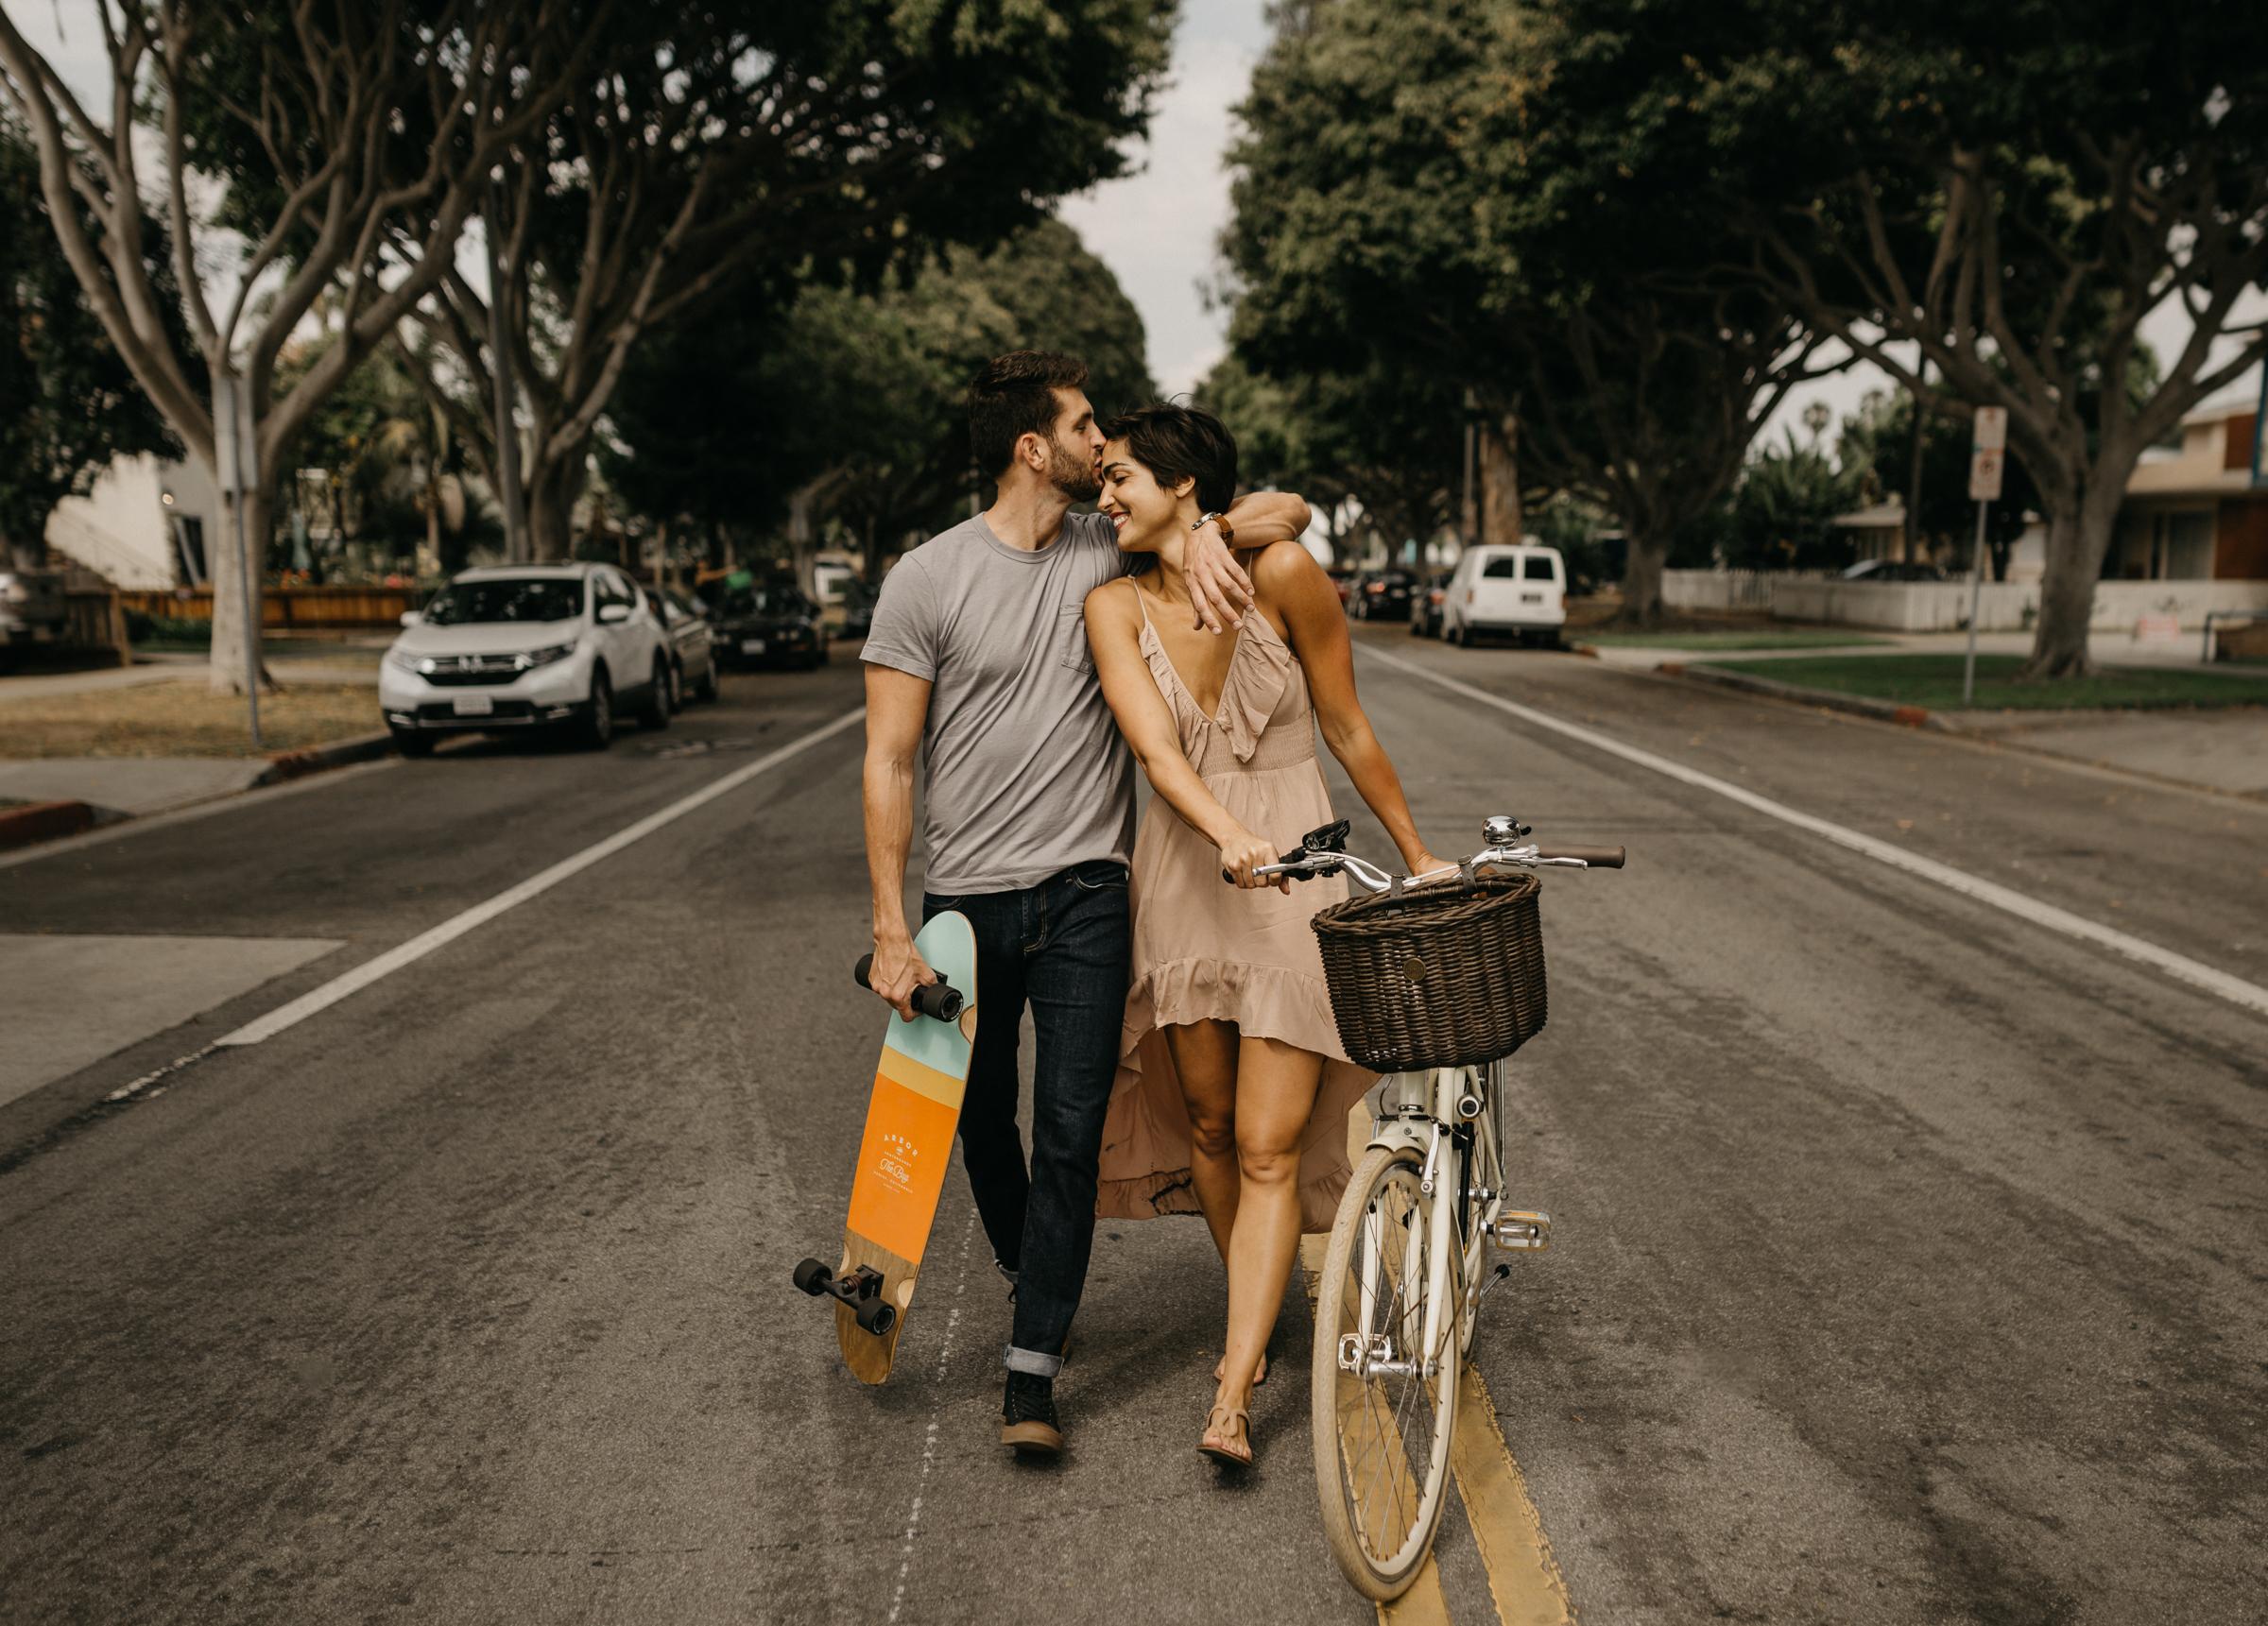 Isaiah + Taylor Photography - Venice Beach & Santa Monica Engagement Session, Los Angeles Wedding Photographer-014.jpg